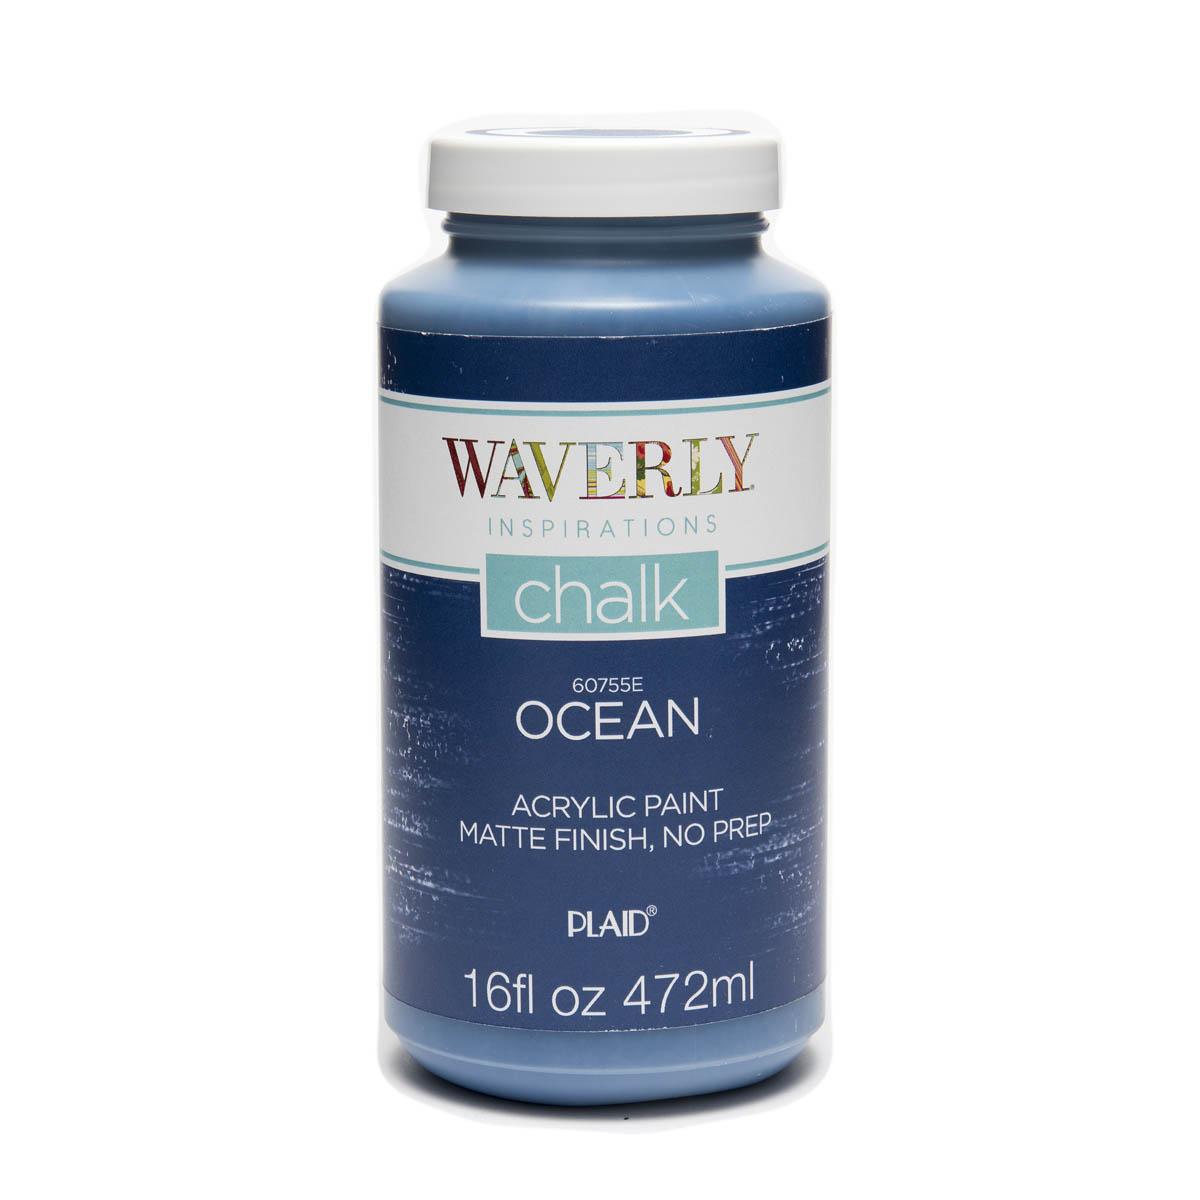 Waverly ® Inspirations Chalk Finish Acrylic Paint - Ocean, 16 oz. - 60755E